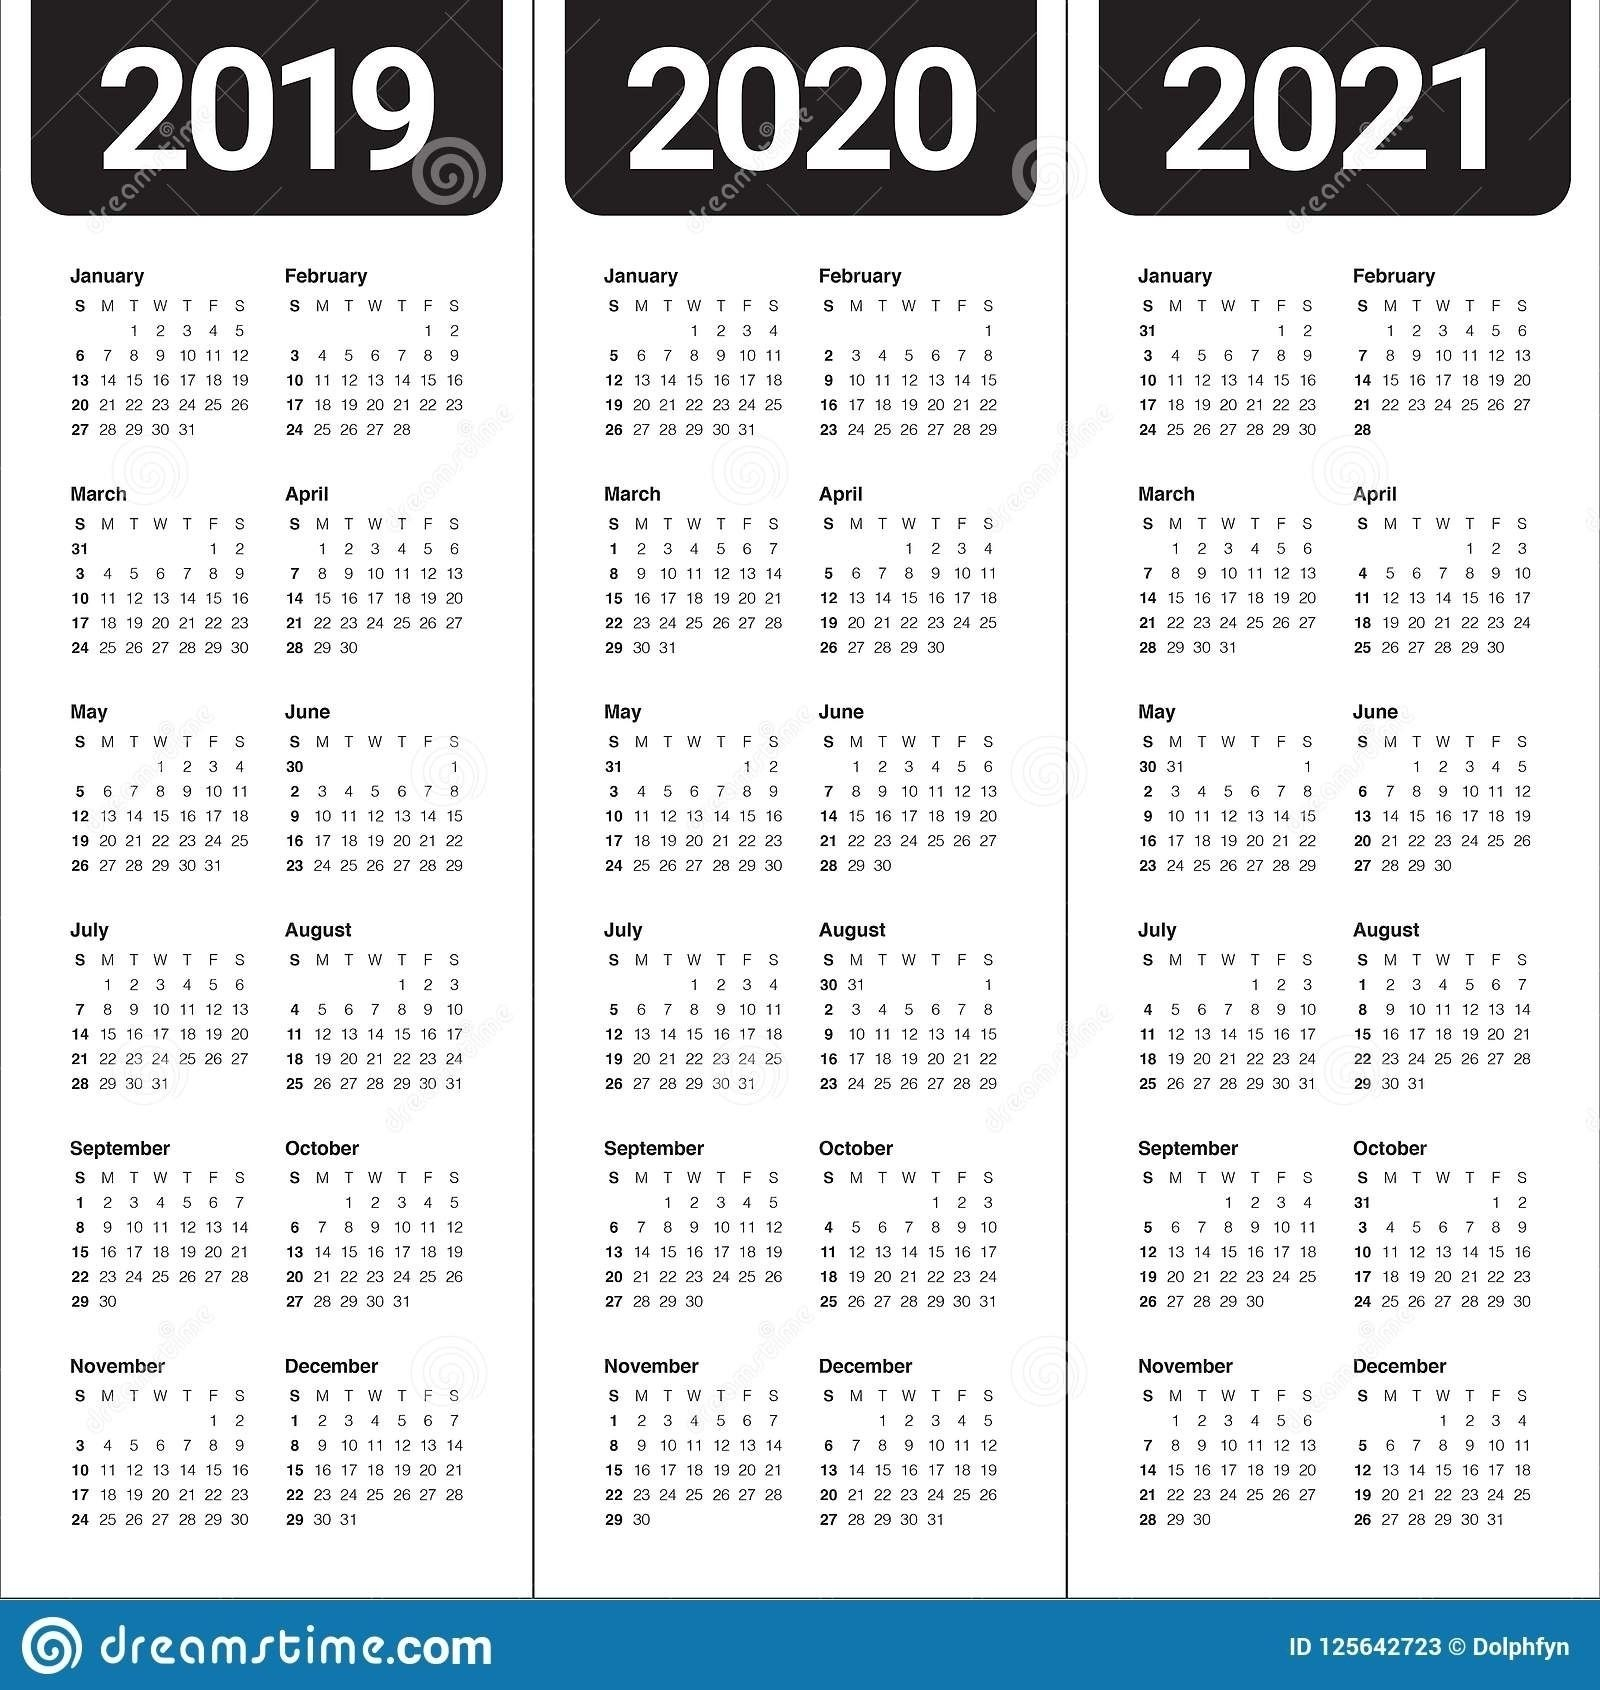 "Incredible 2 Year Calendar 2020 And 2021 In 2020 | Calendar  ""Depo Provera"" And ""Printable Calendar"" And 2021"